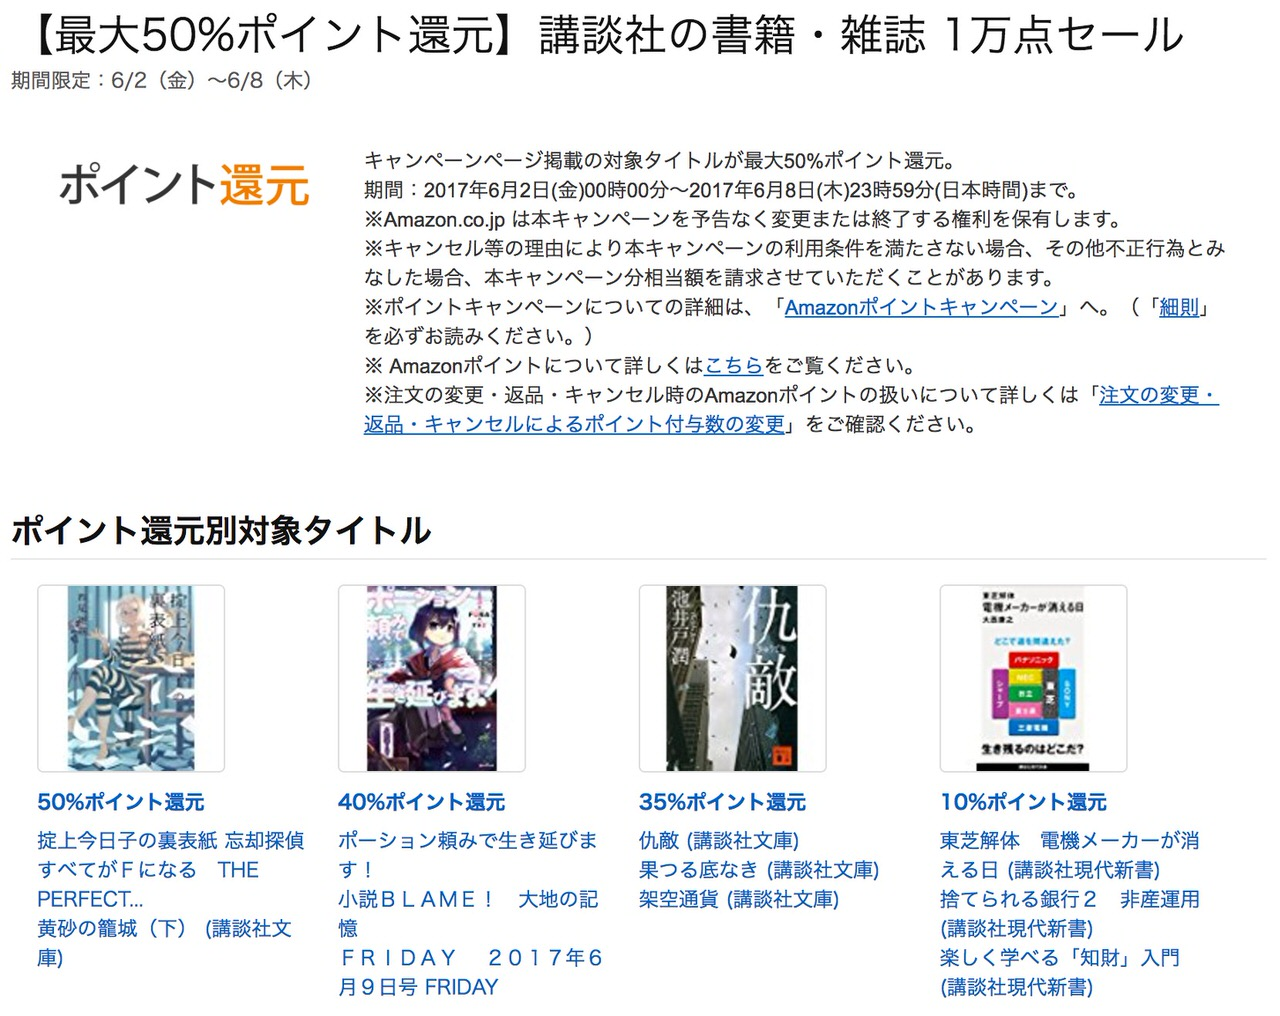 Kindle【最大50%ポイント還元】講談社の書籍・雑誌1万点セール(6月8日まで)